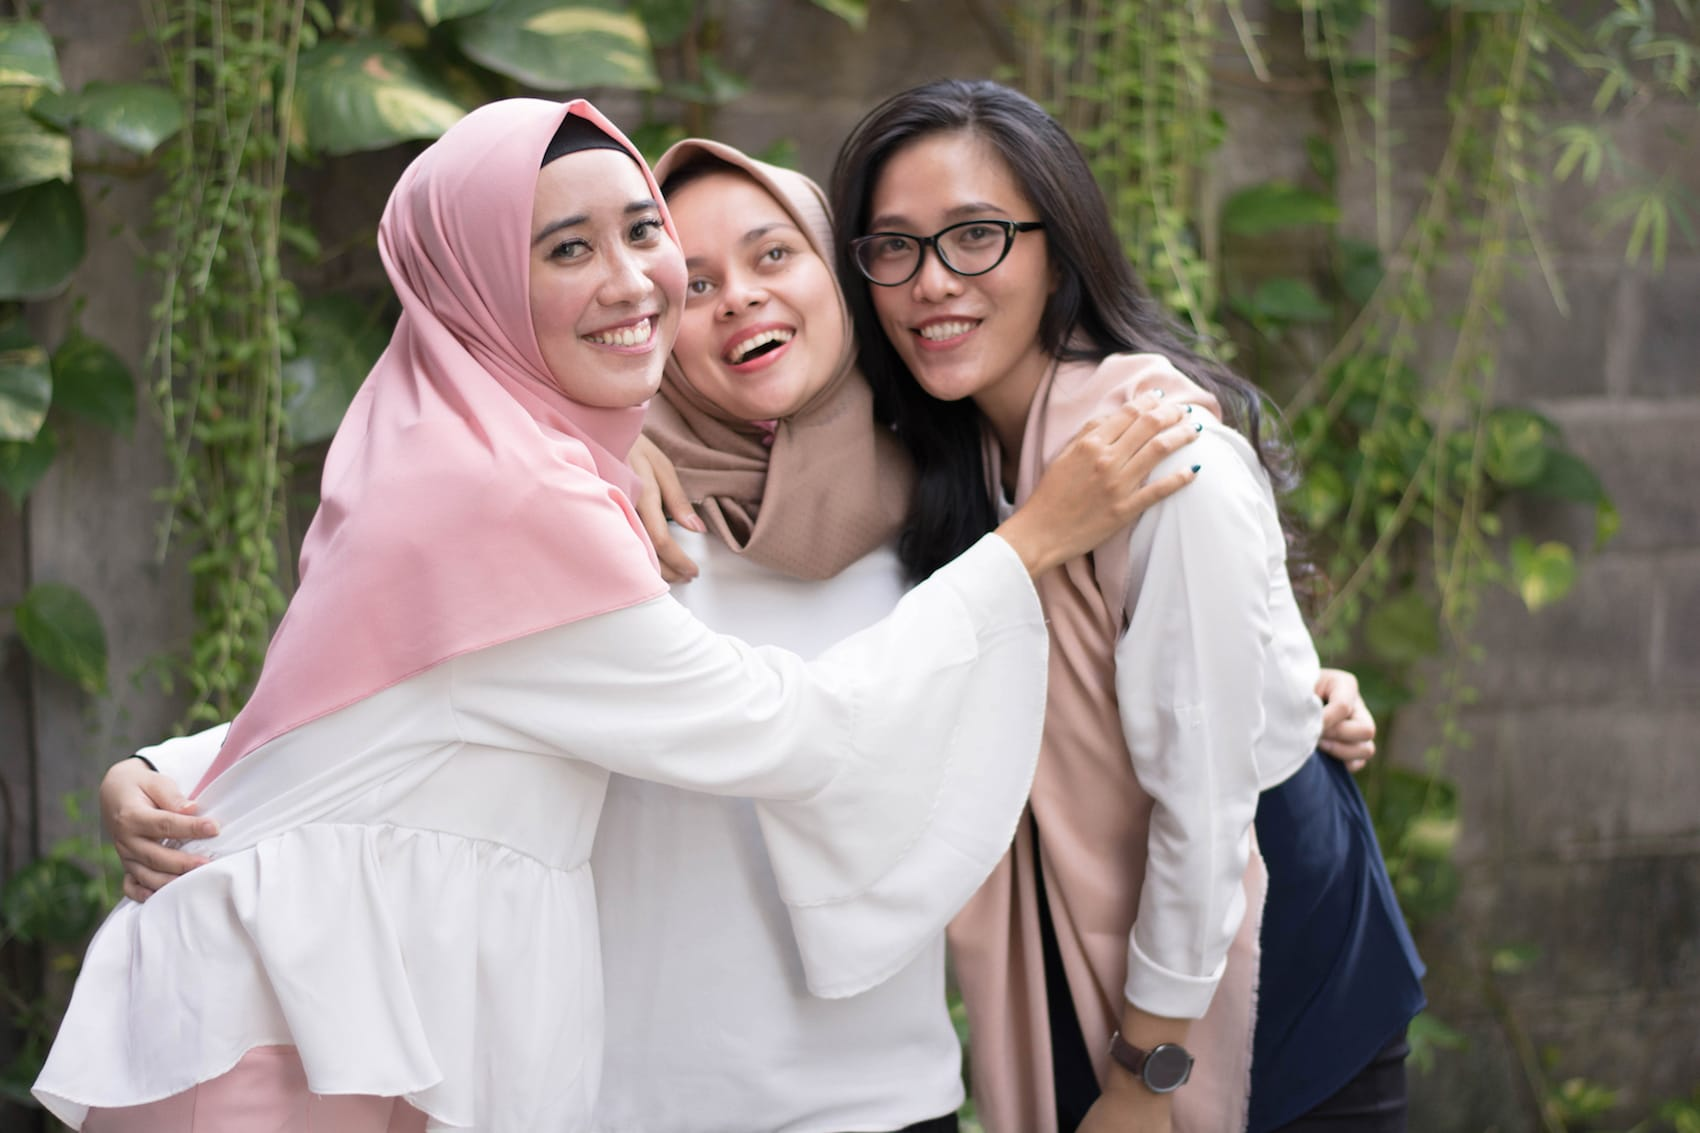 Tiga wanita asia dengan dua hijab dan satu tanpa hijab tersenyum ke kamera